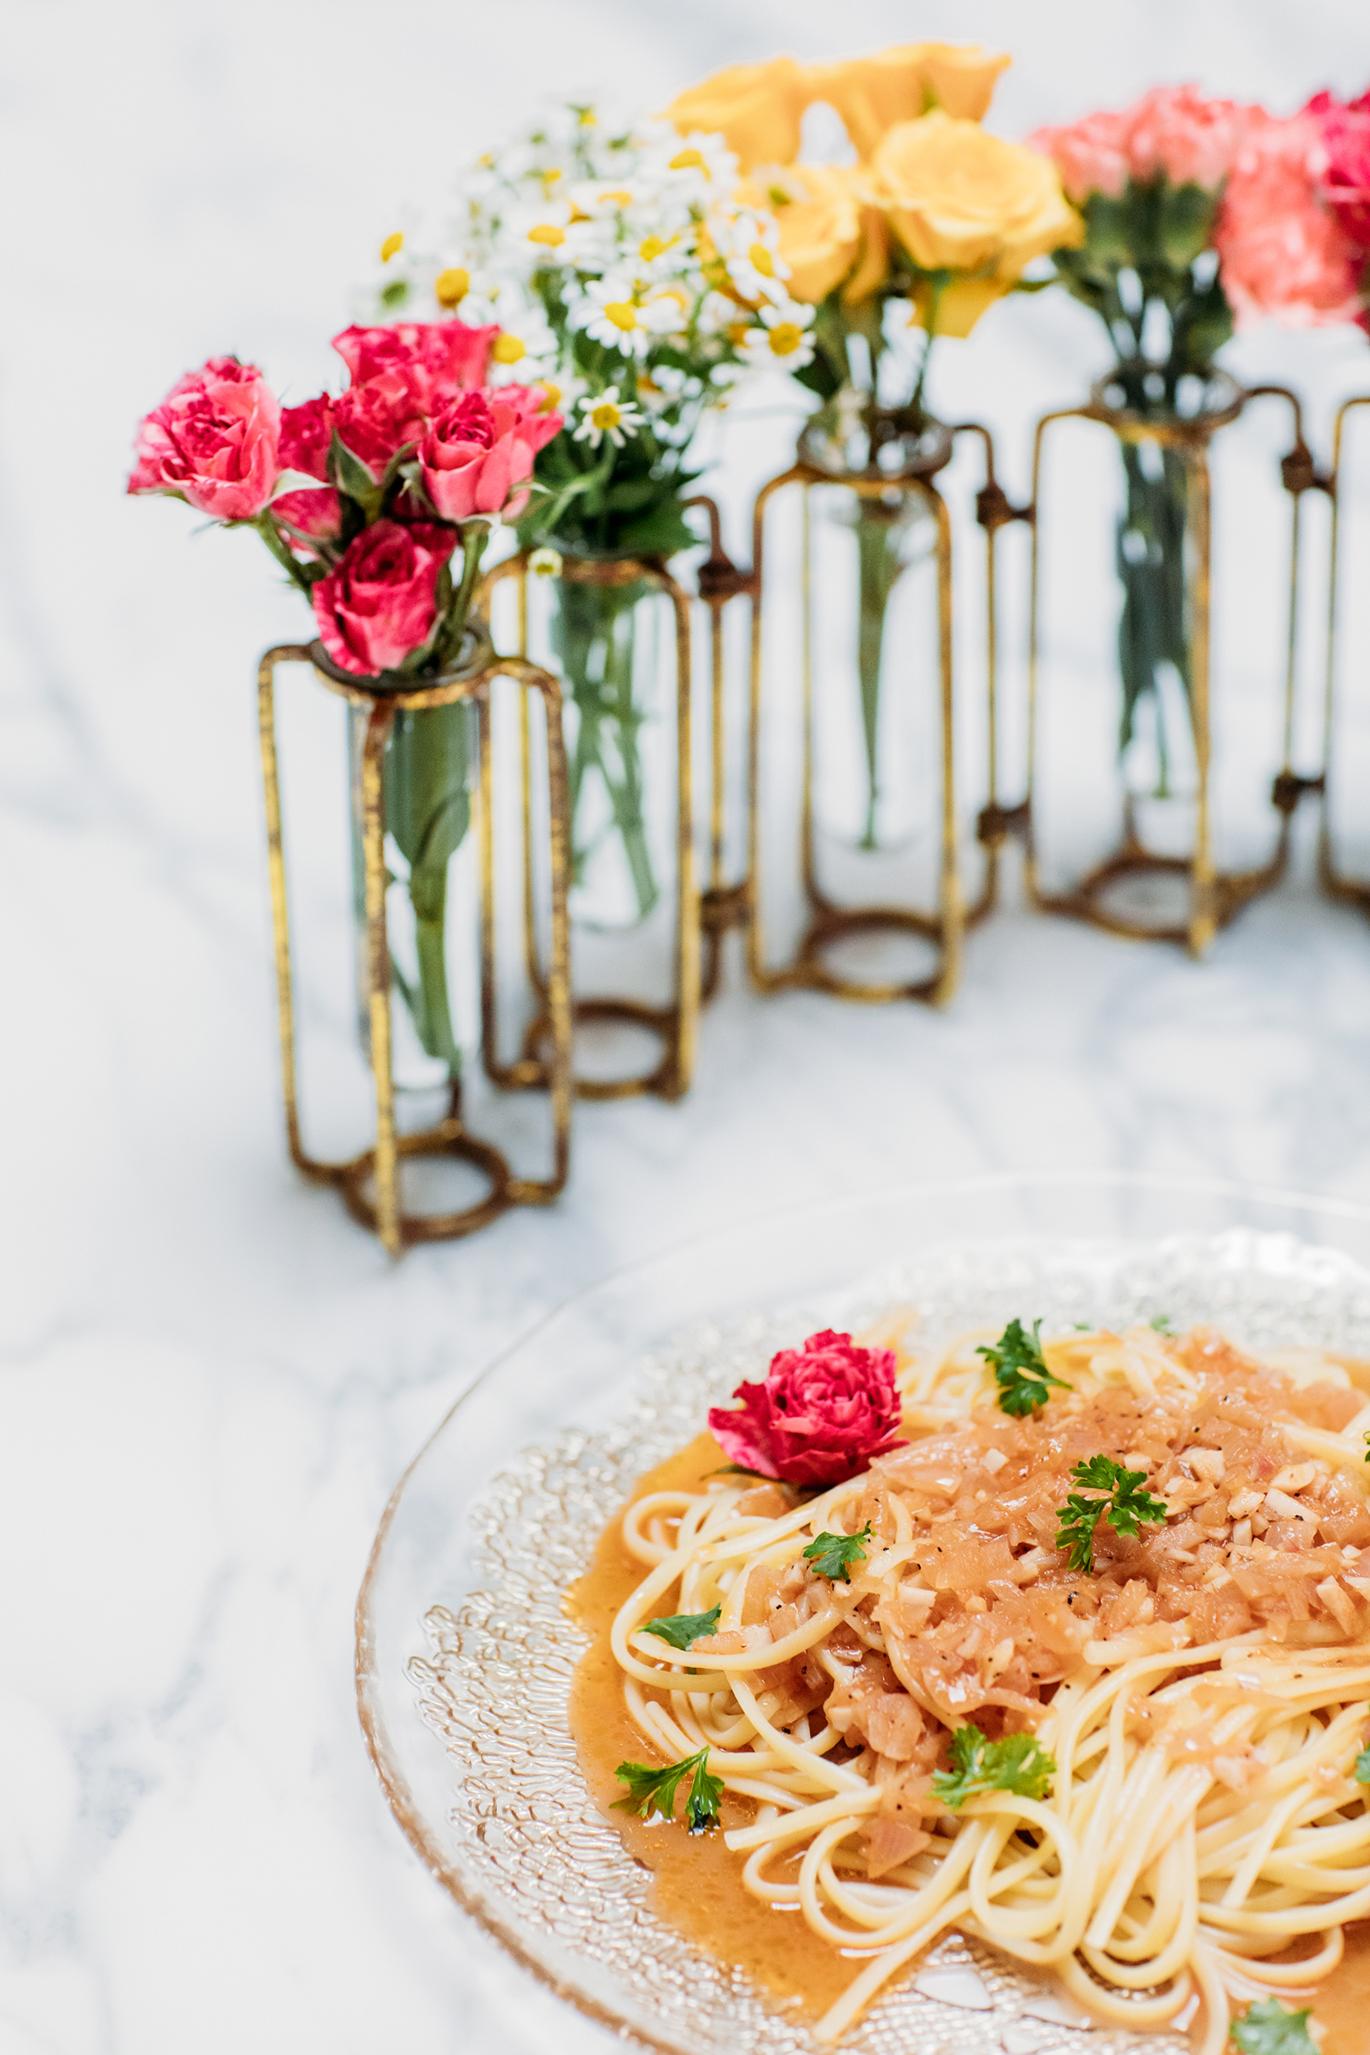 Summer pasta dish